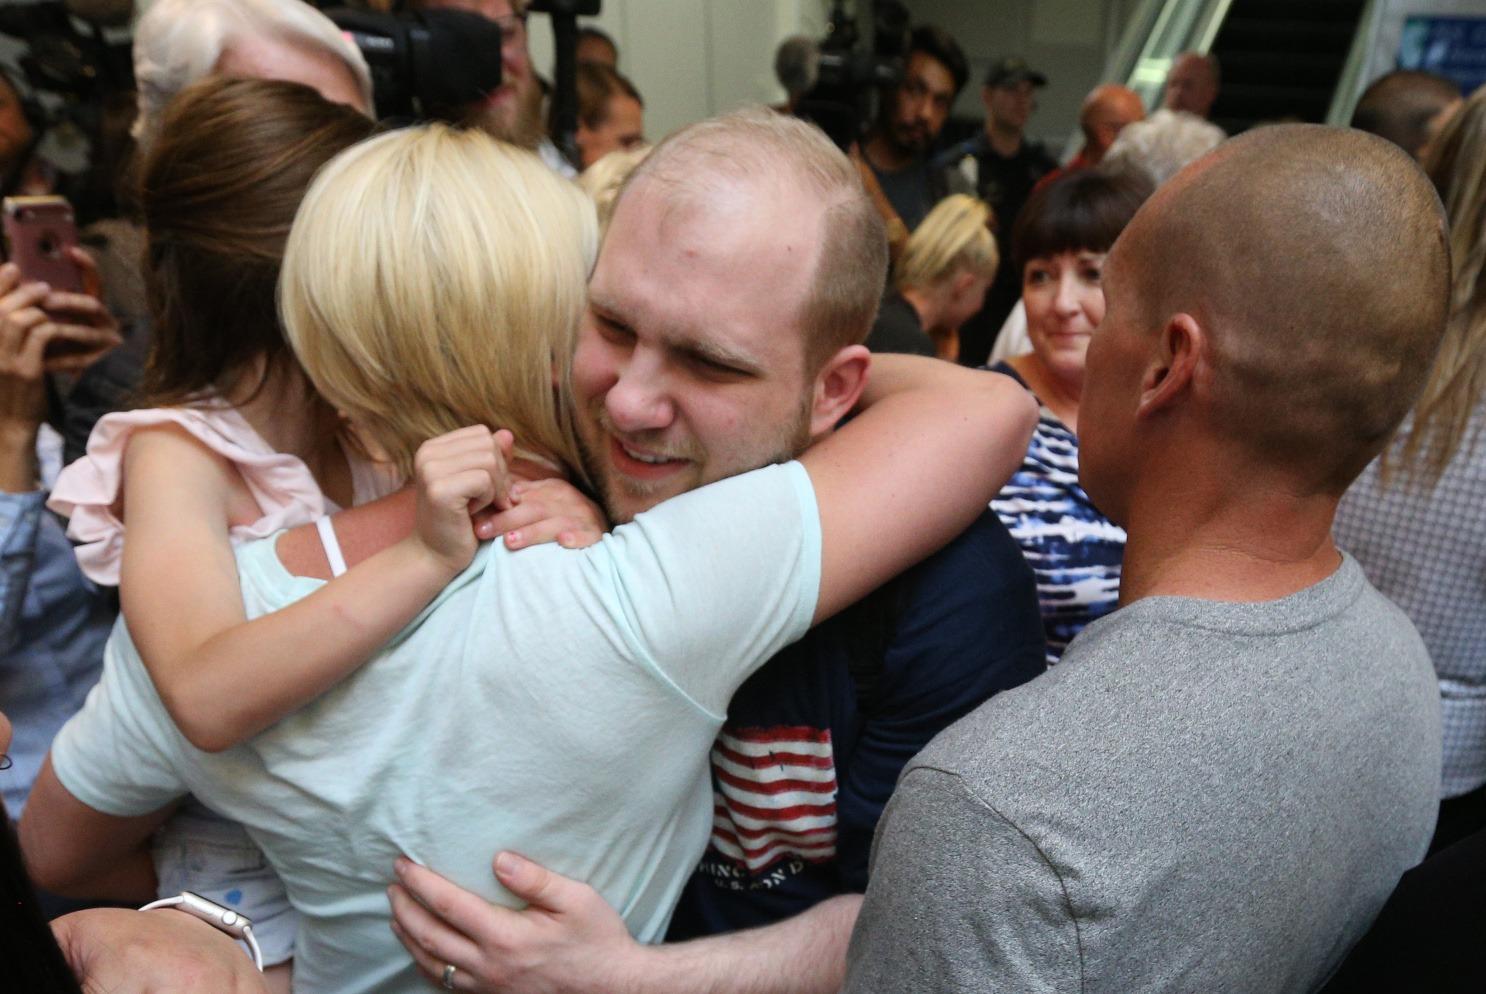 Friends and family hug and greet Josh Holt, upon his return to Utah at the Salt Lake City International Airport on May 28, 2018, in Salt Lake City, Utah.